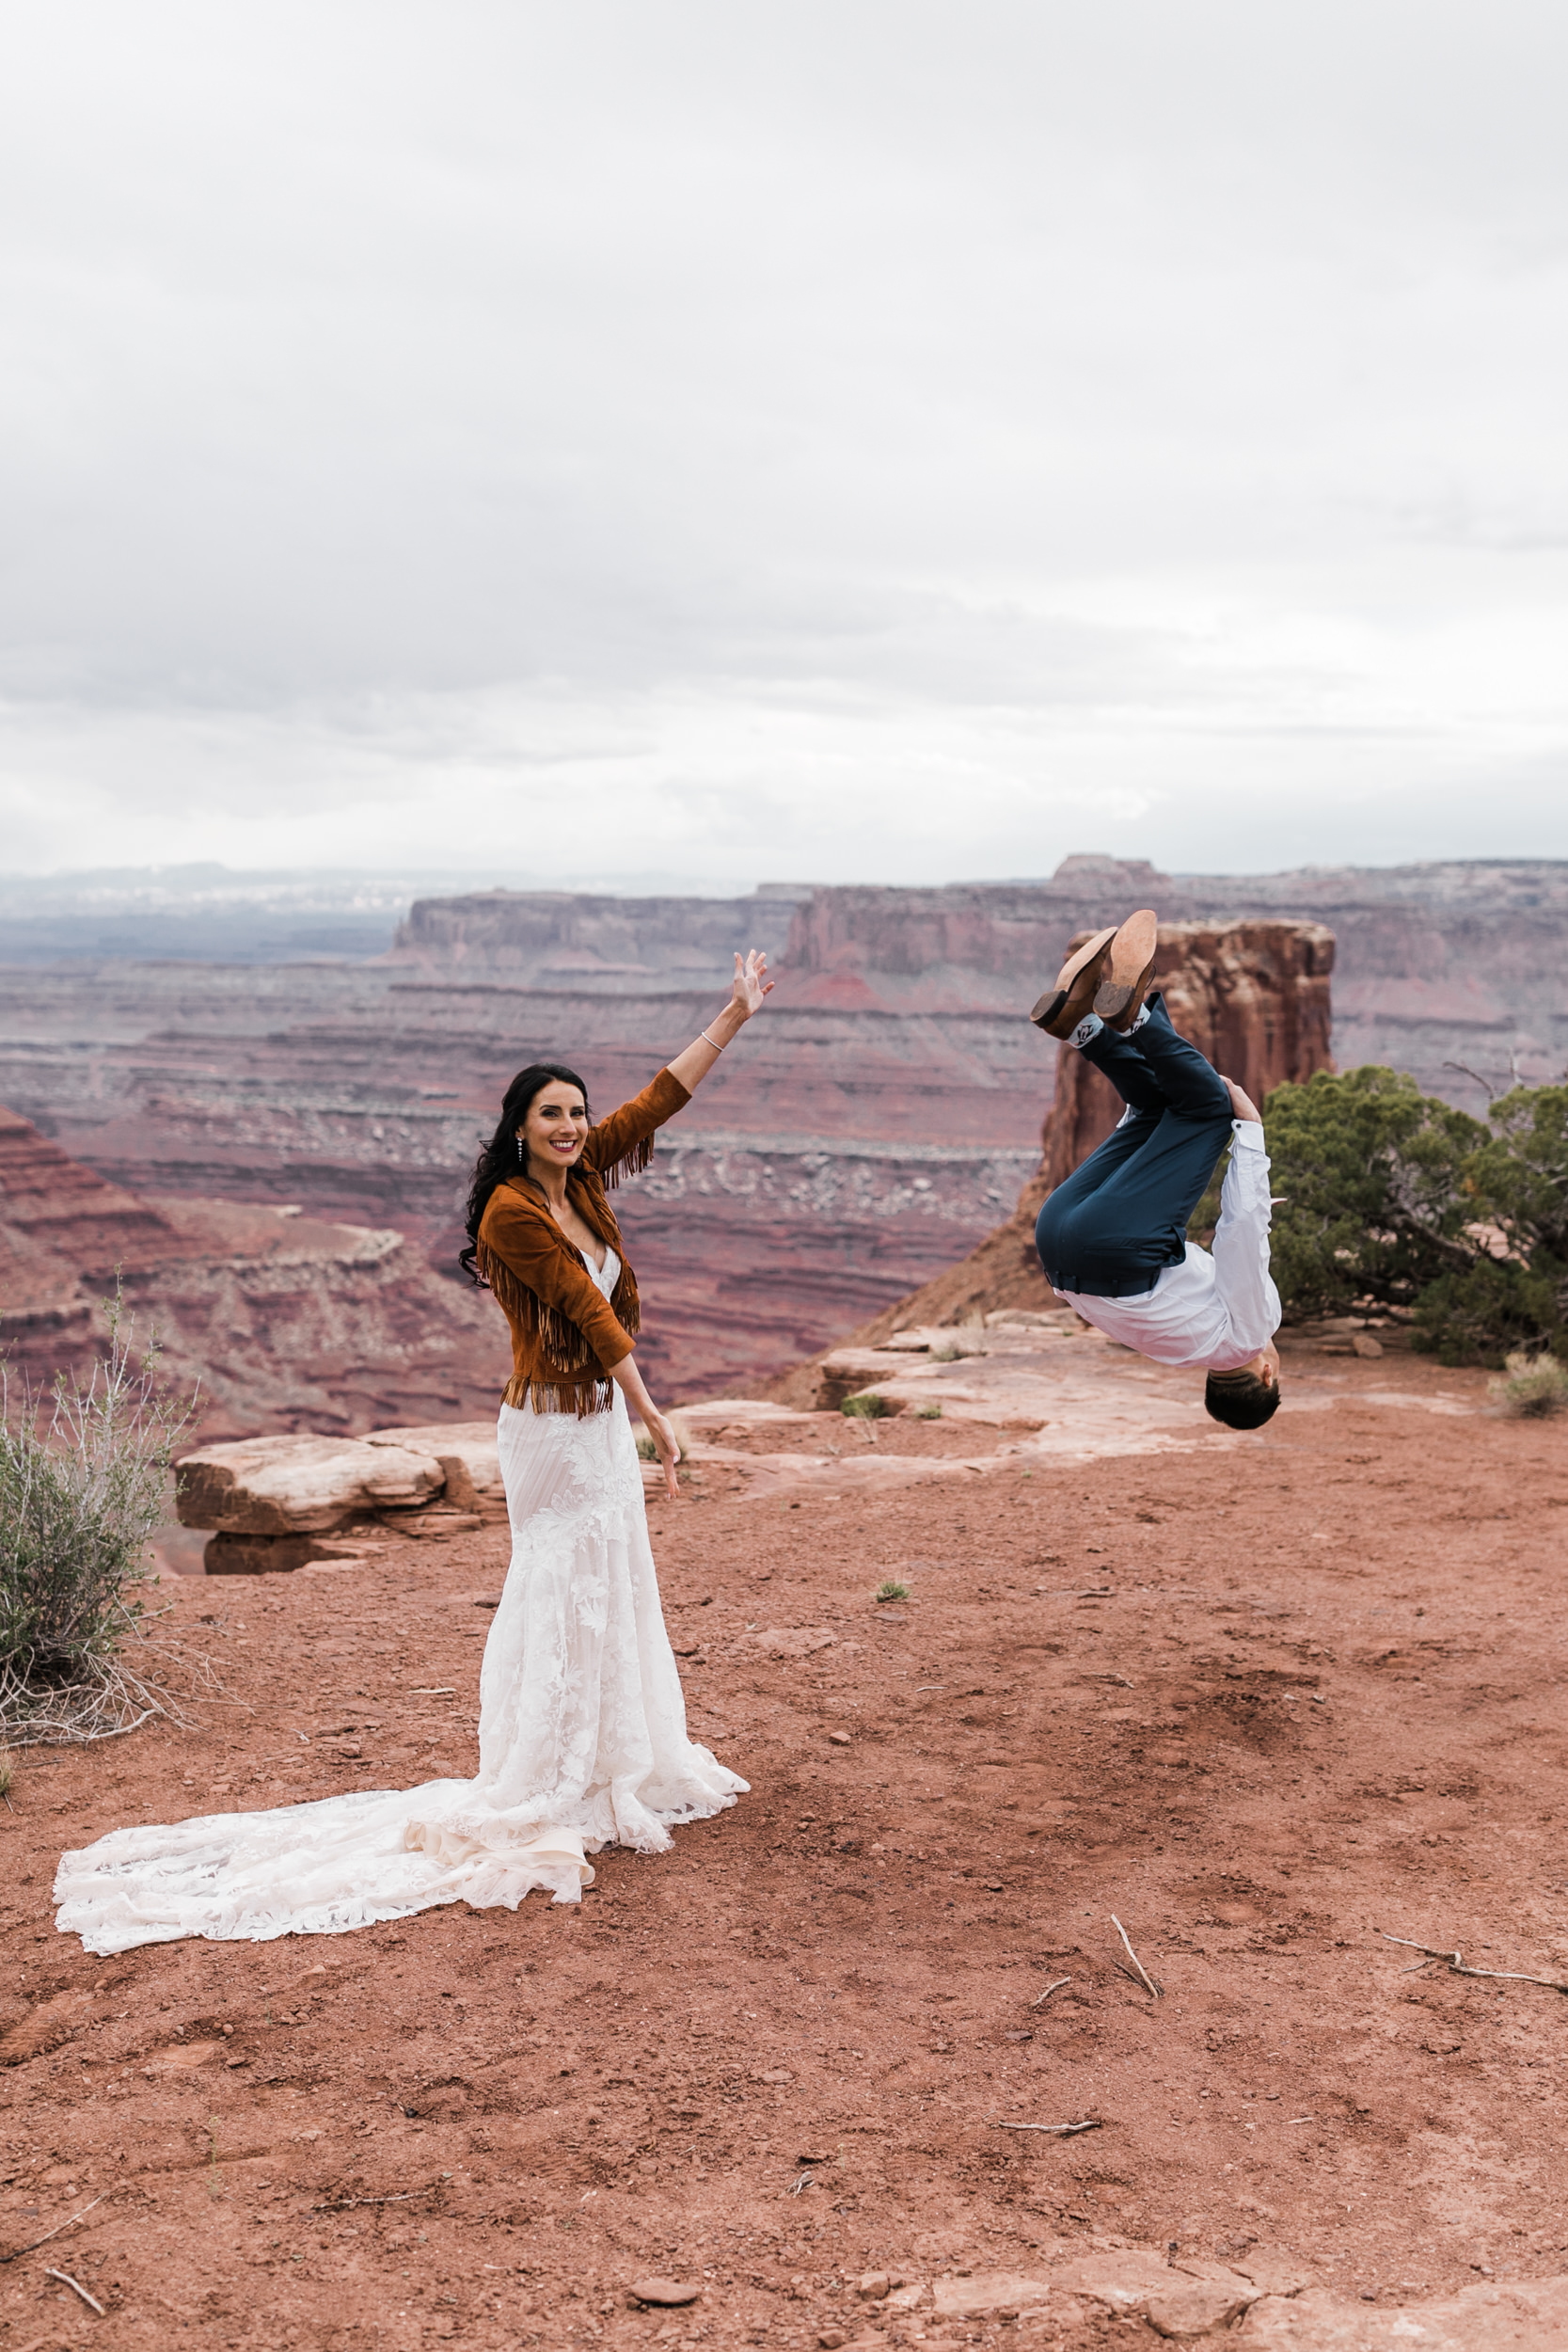 Jeep-Wedding-Moab-Utah-Hearnes-Adventure-Elopement-Photography-38.jpg